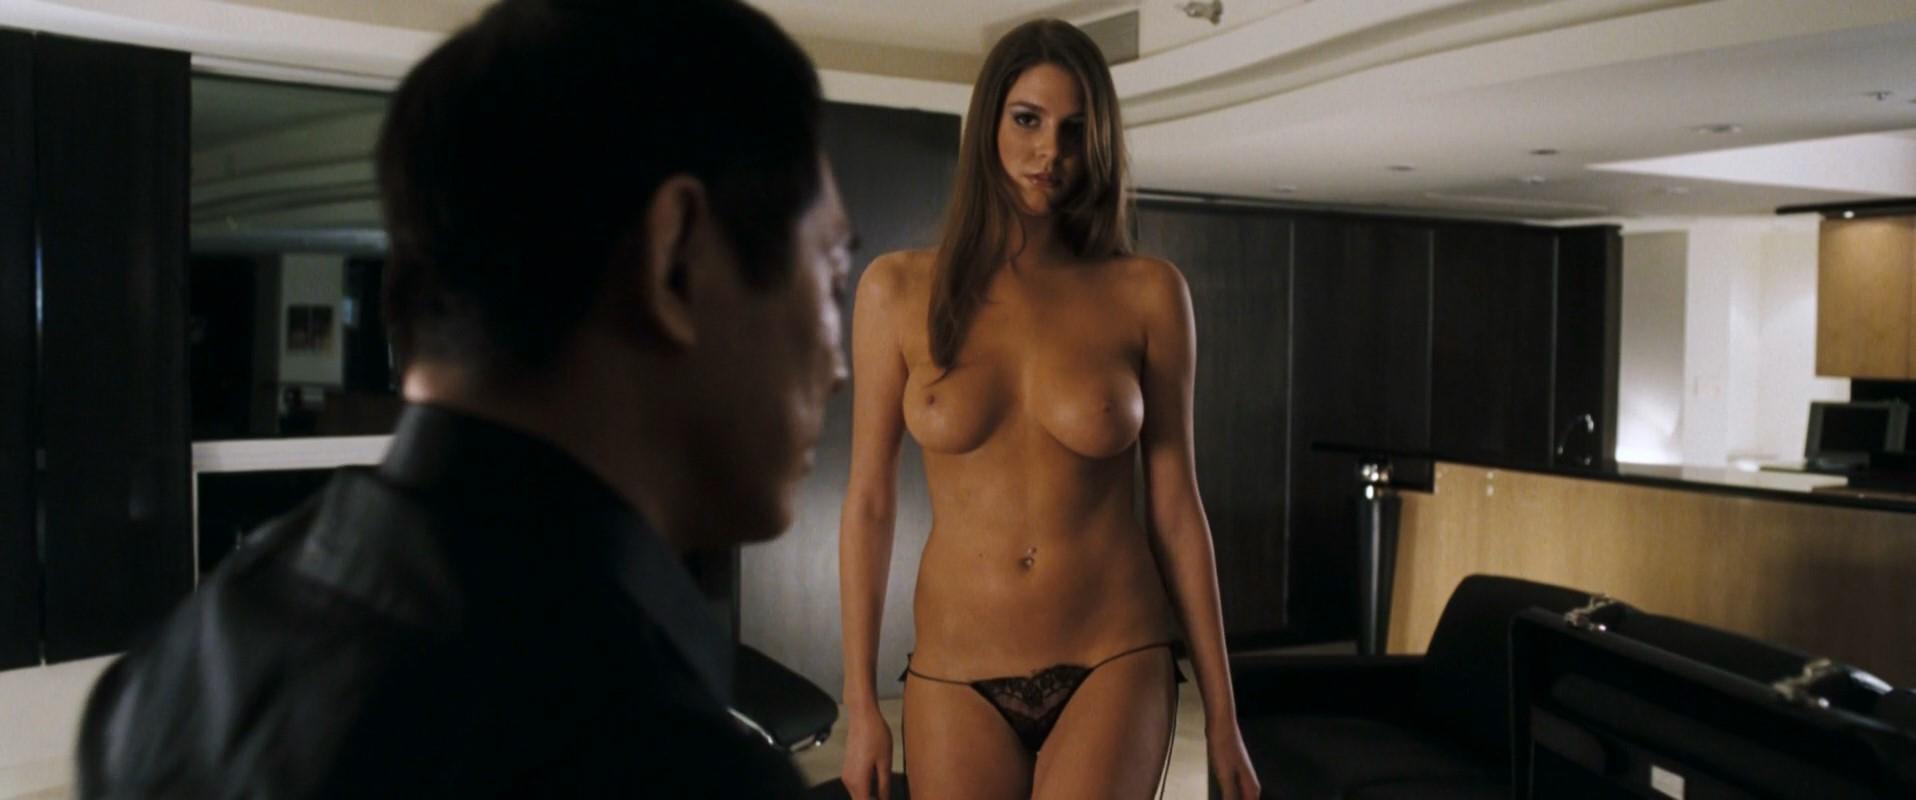 Meghan flather nude in war